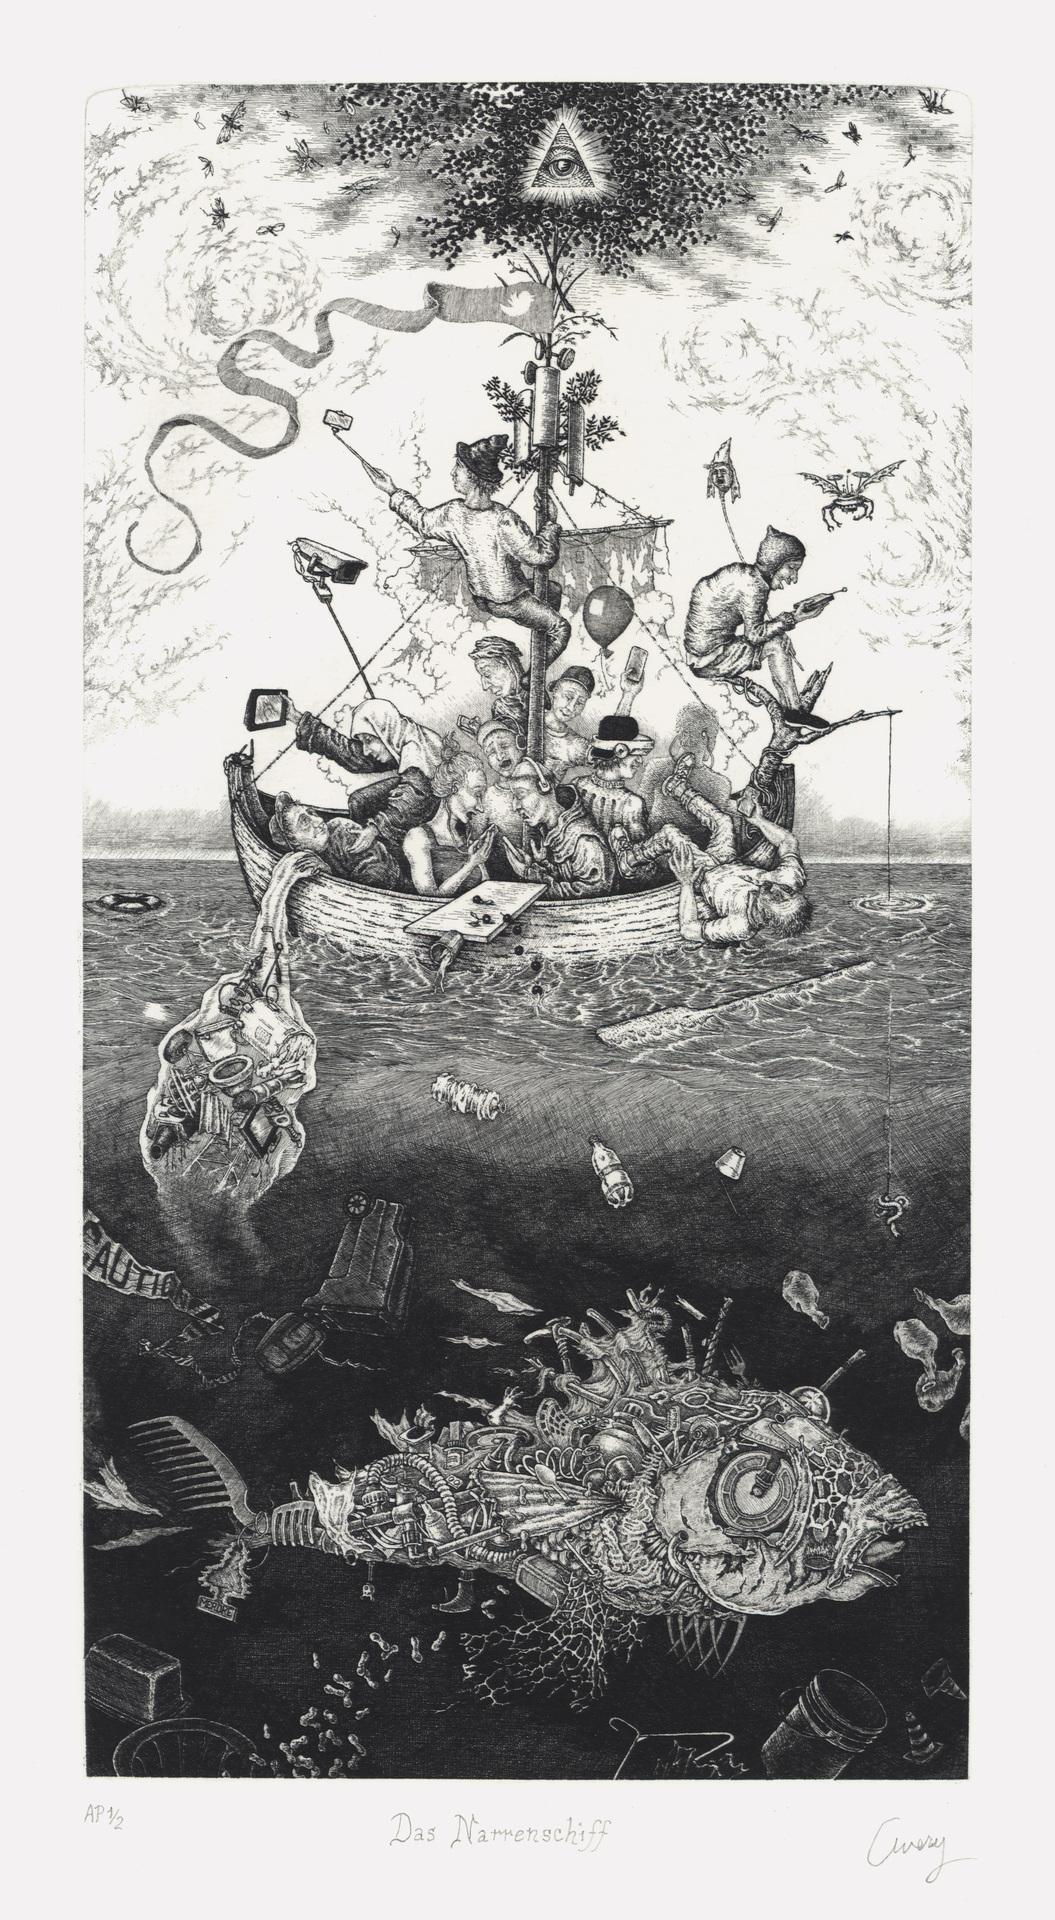 Das Narrenschiff, David Avery